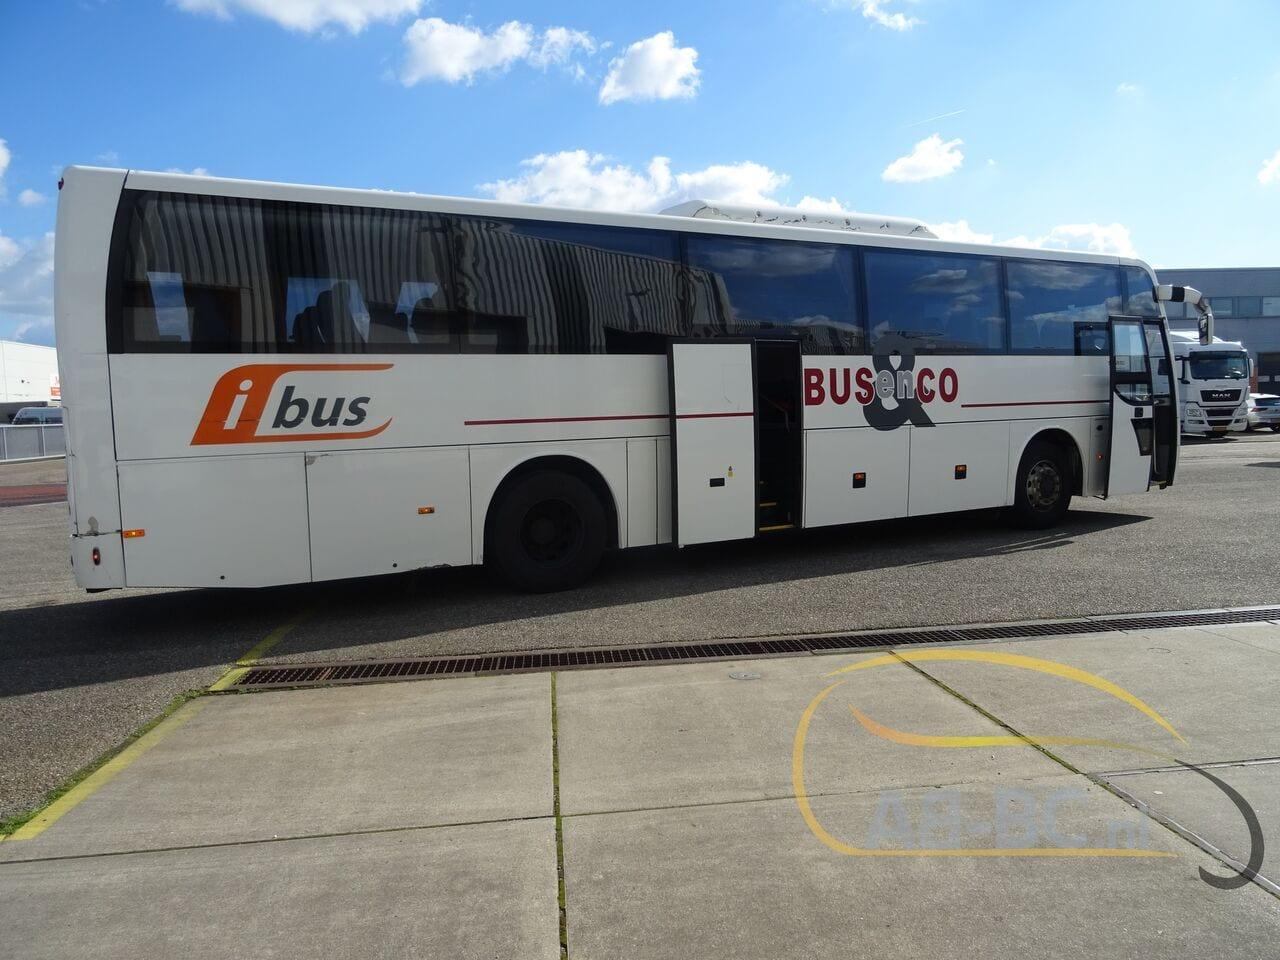 coach-busTEMSA-Safari-RD-53-Seats-DAF-Motor-12-mtr---1616164251350345616_big_994061fcd941fa837e423ee1f067c9b8--21031916283496651600